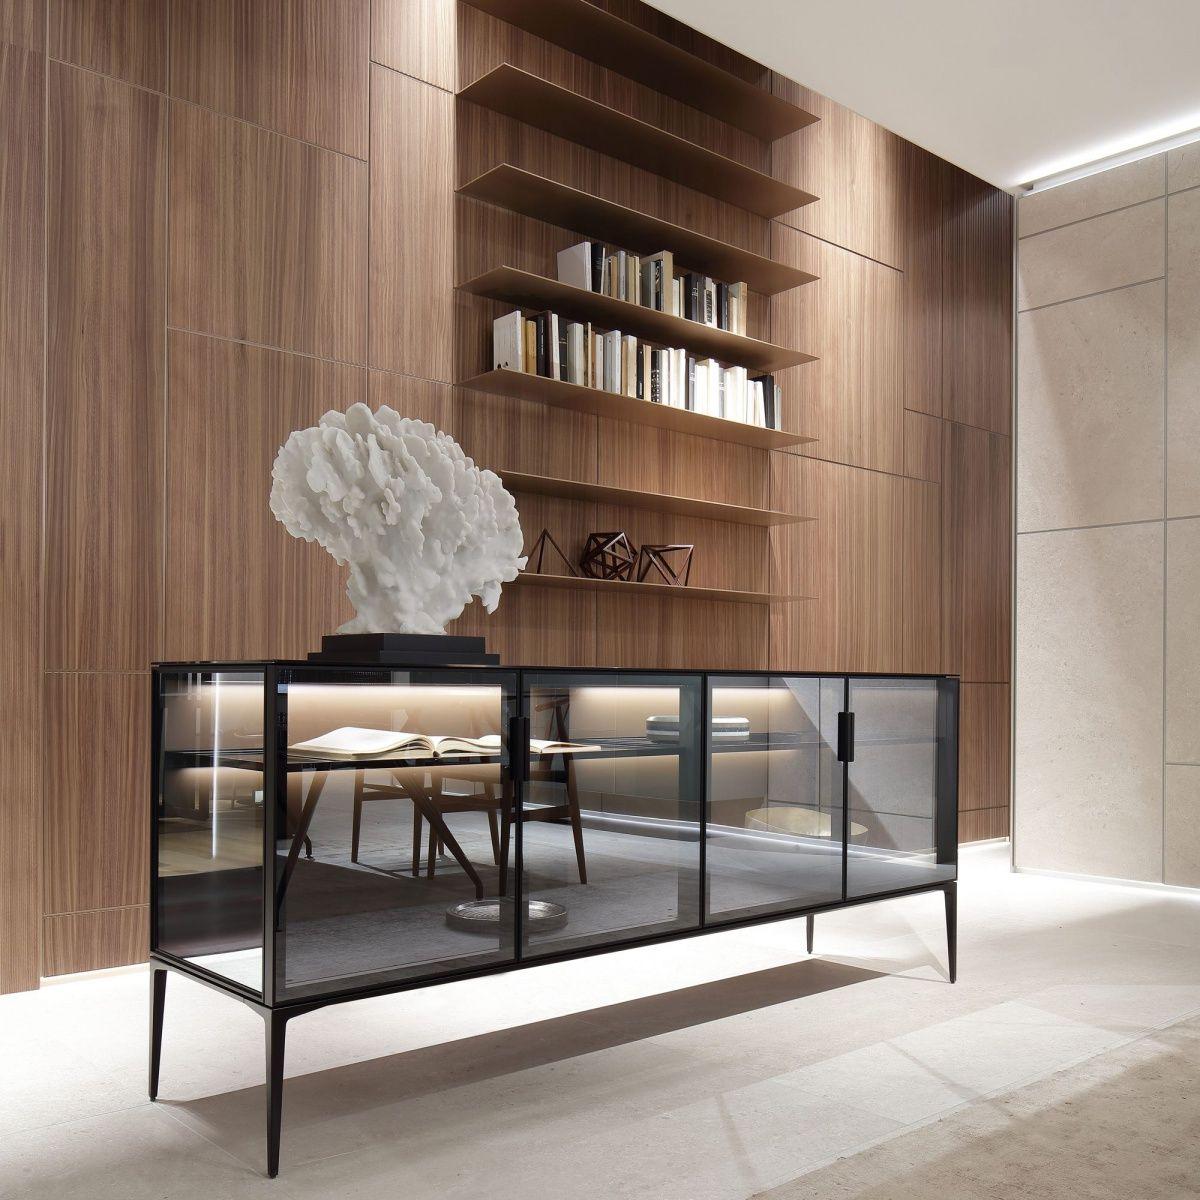 Rimadesio Alambra 02 Furniture In 2019 Woonkamerkasten